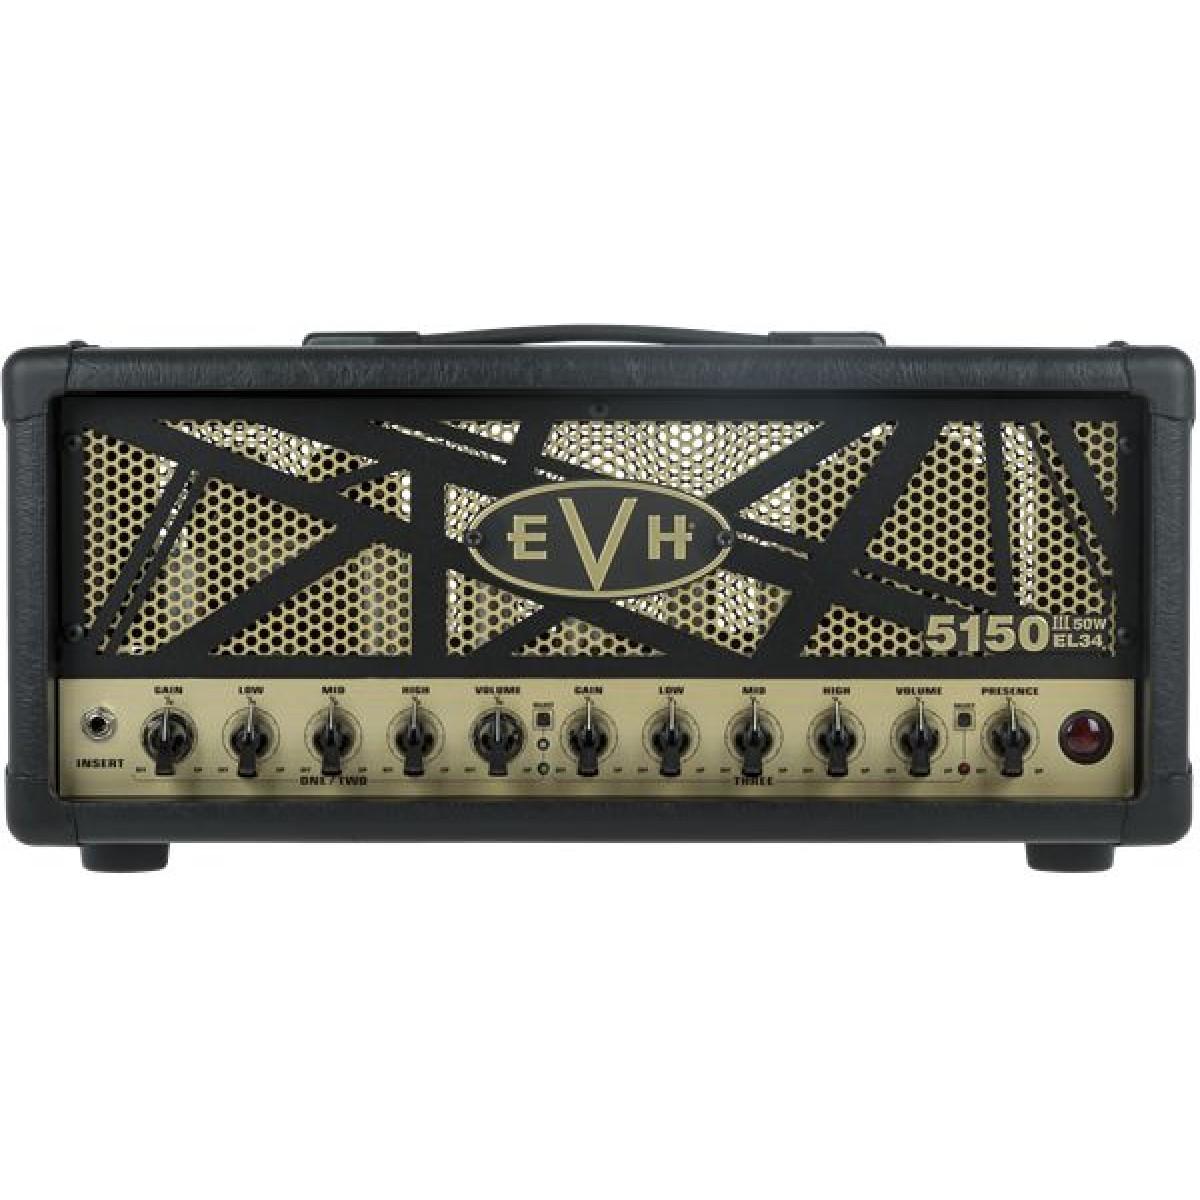 evh 5150iii 50w el34 guitar amplifier head. Black Bedroom Furniture Sets. Home Design Ideas